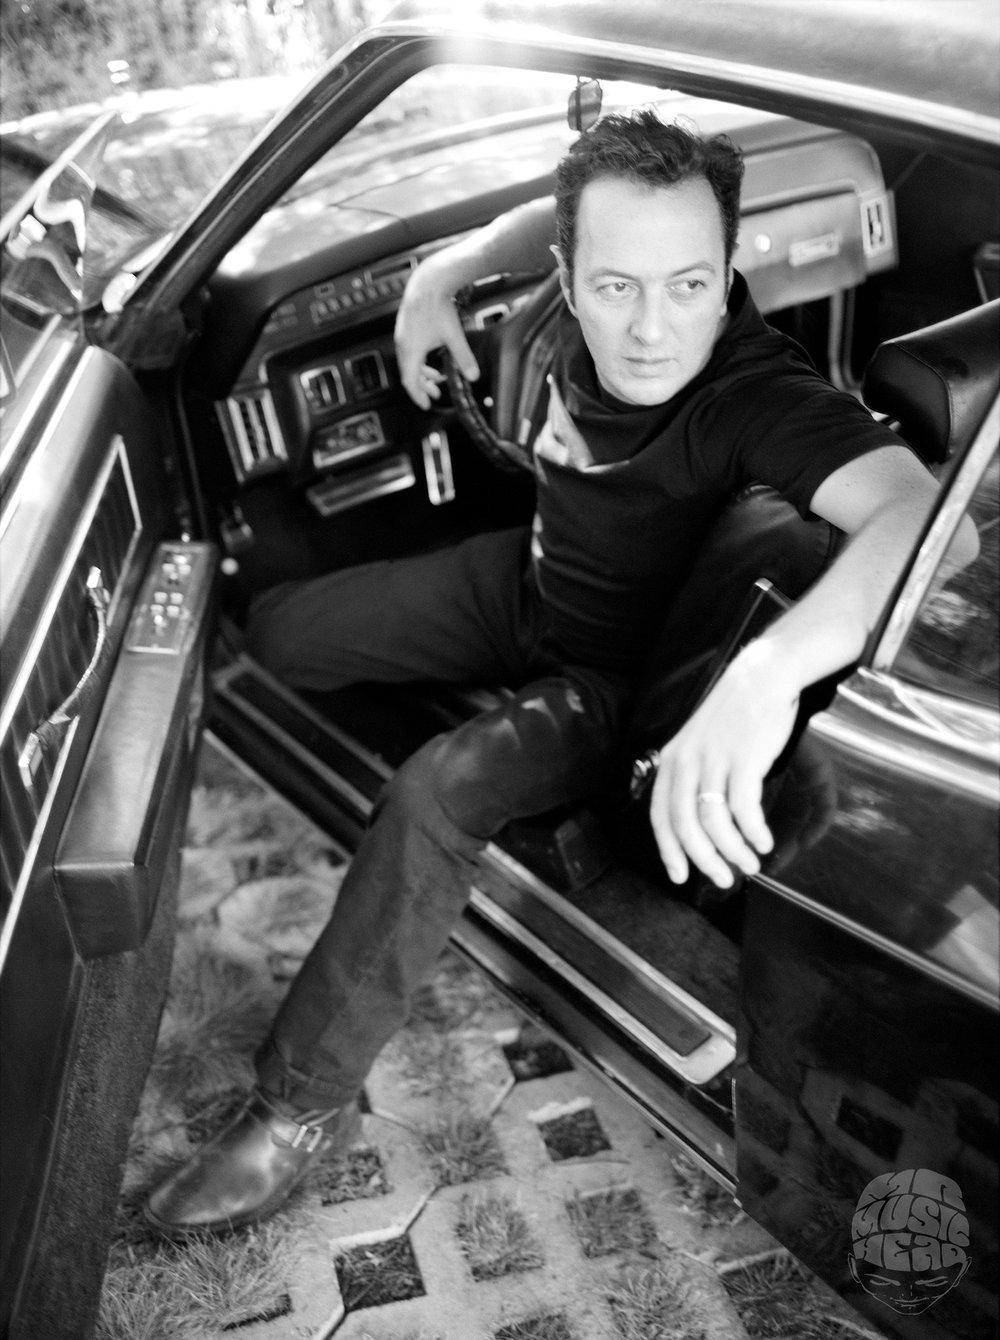 steven dewall_the clash_Joe Strummer_car.jpg